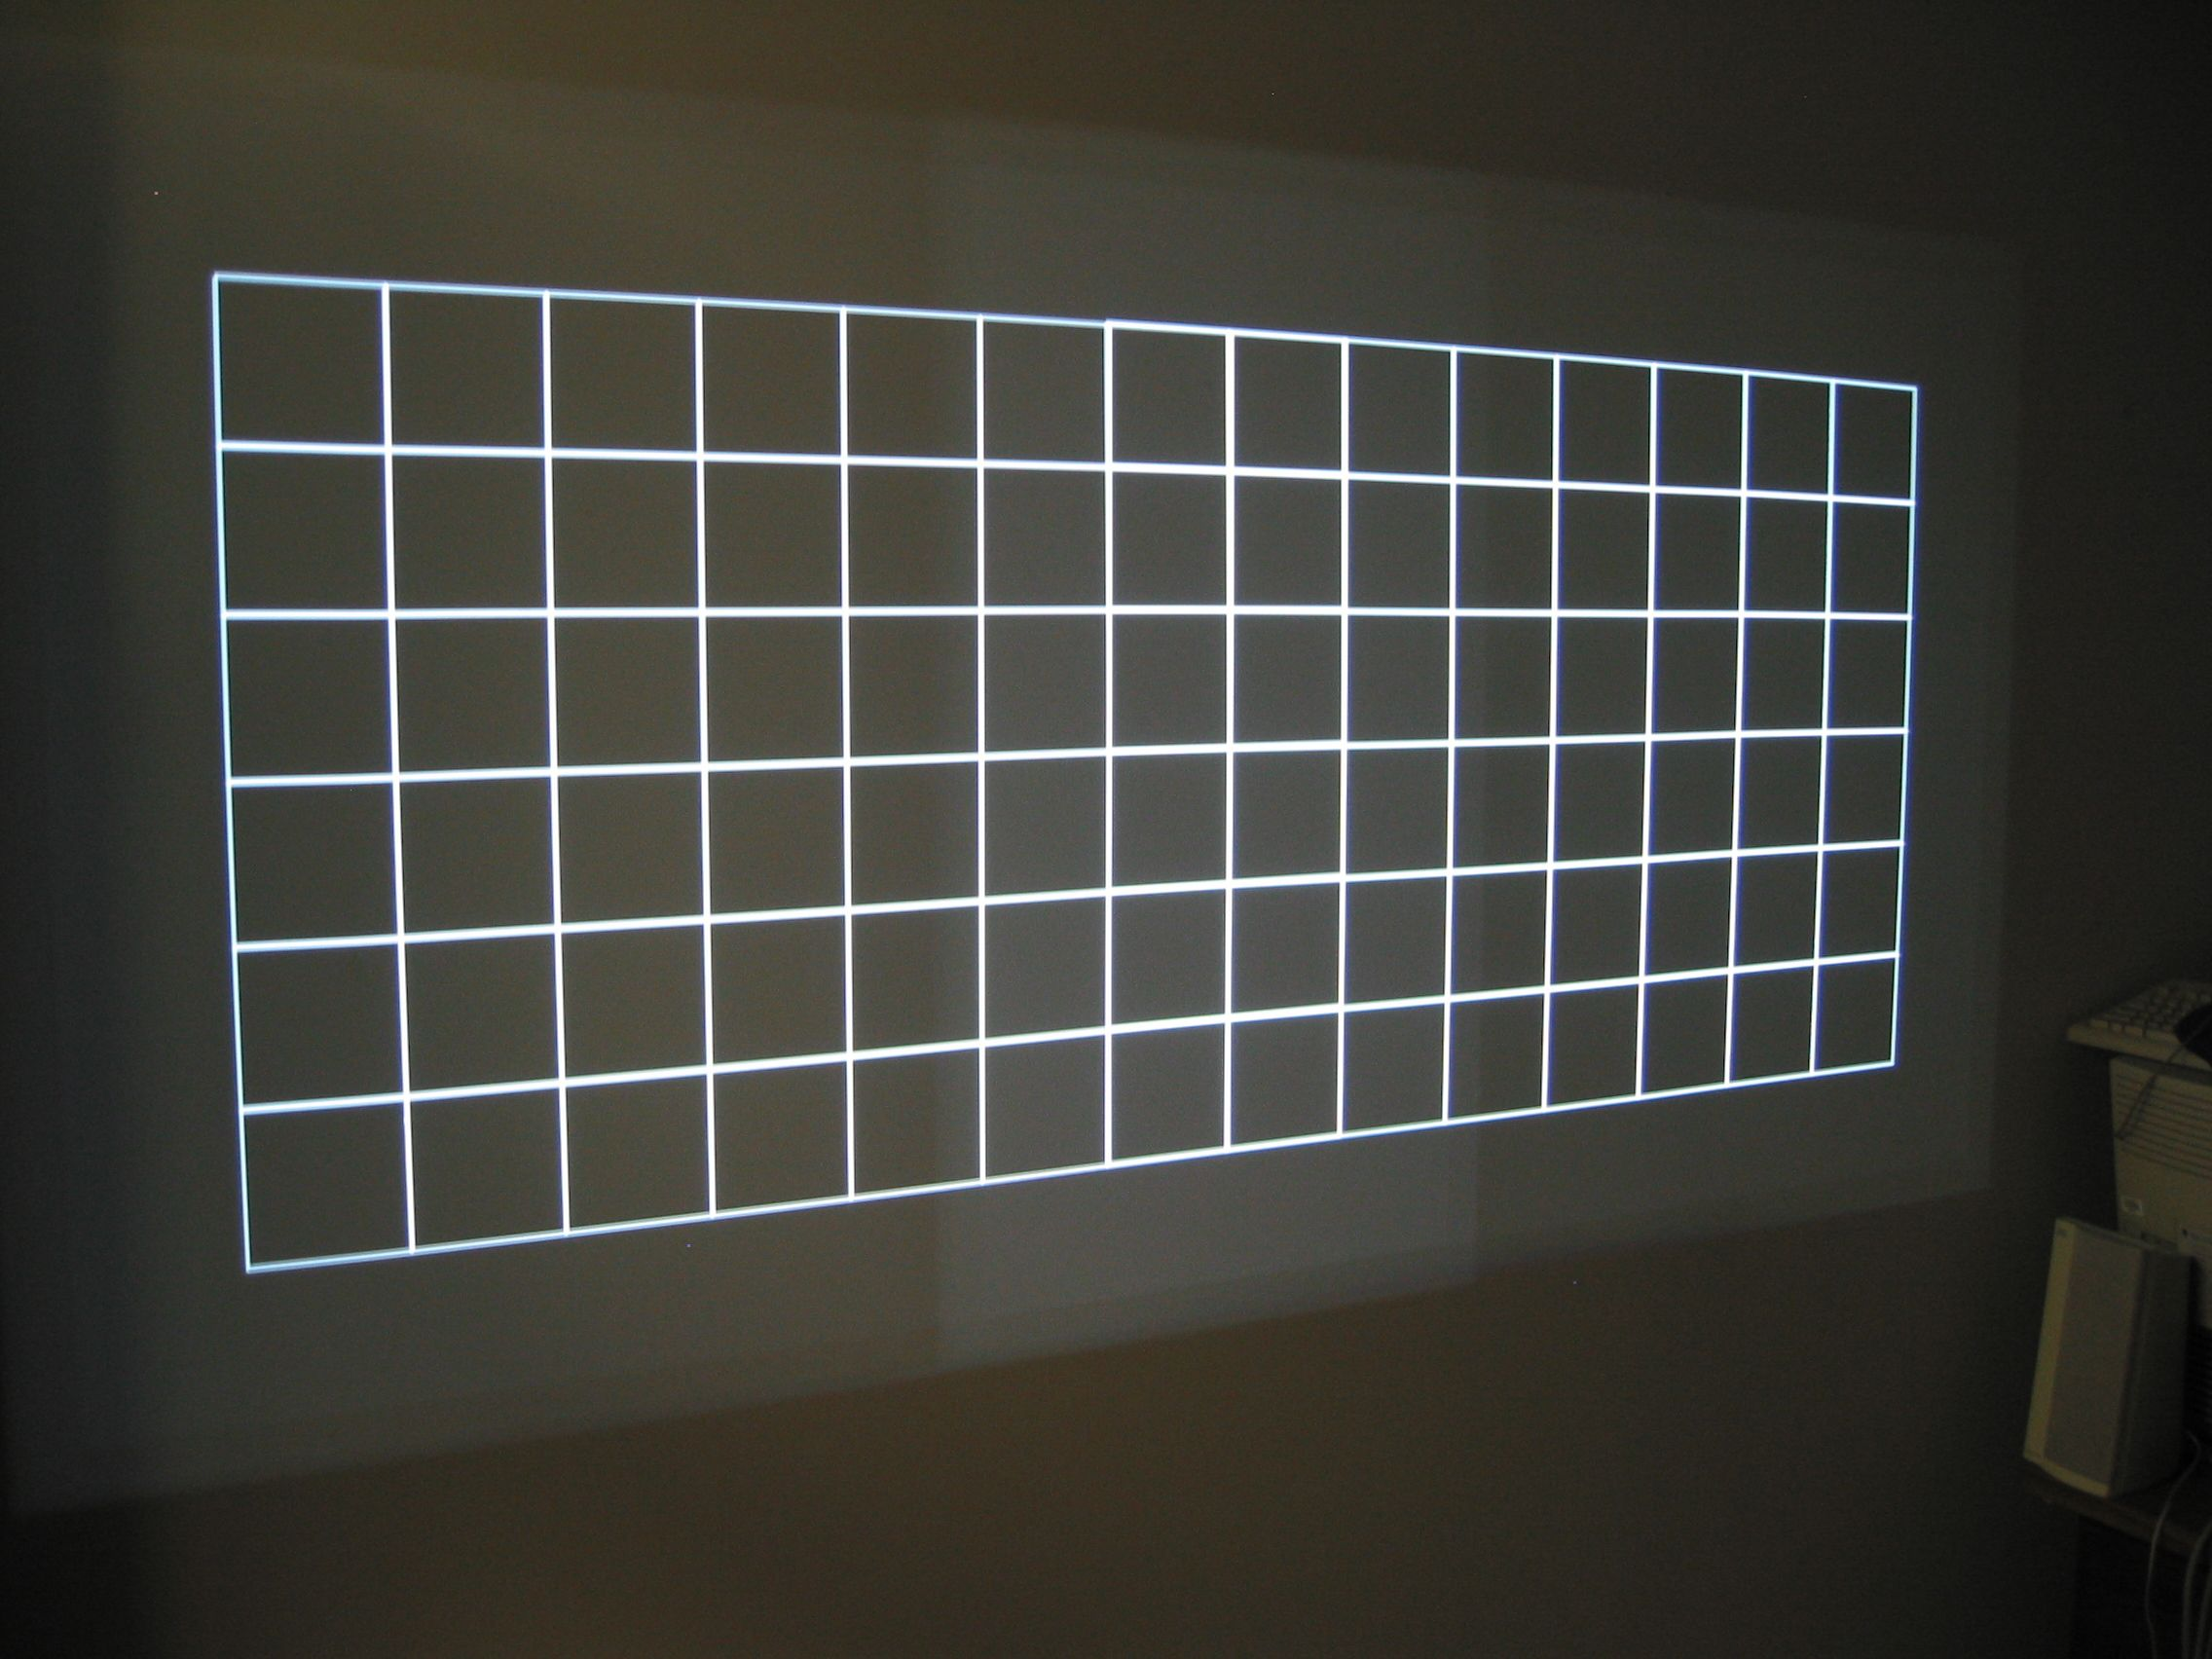 Edge blending using commodity projectors